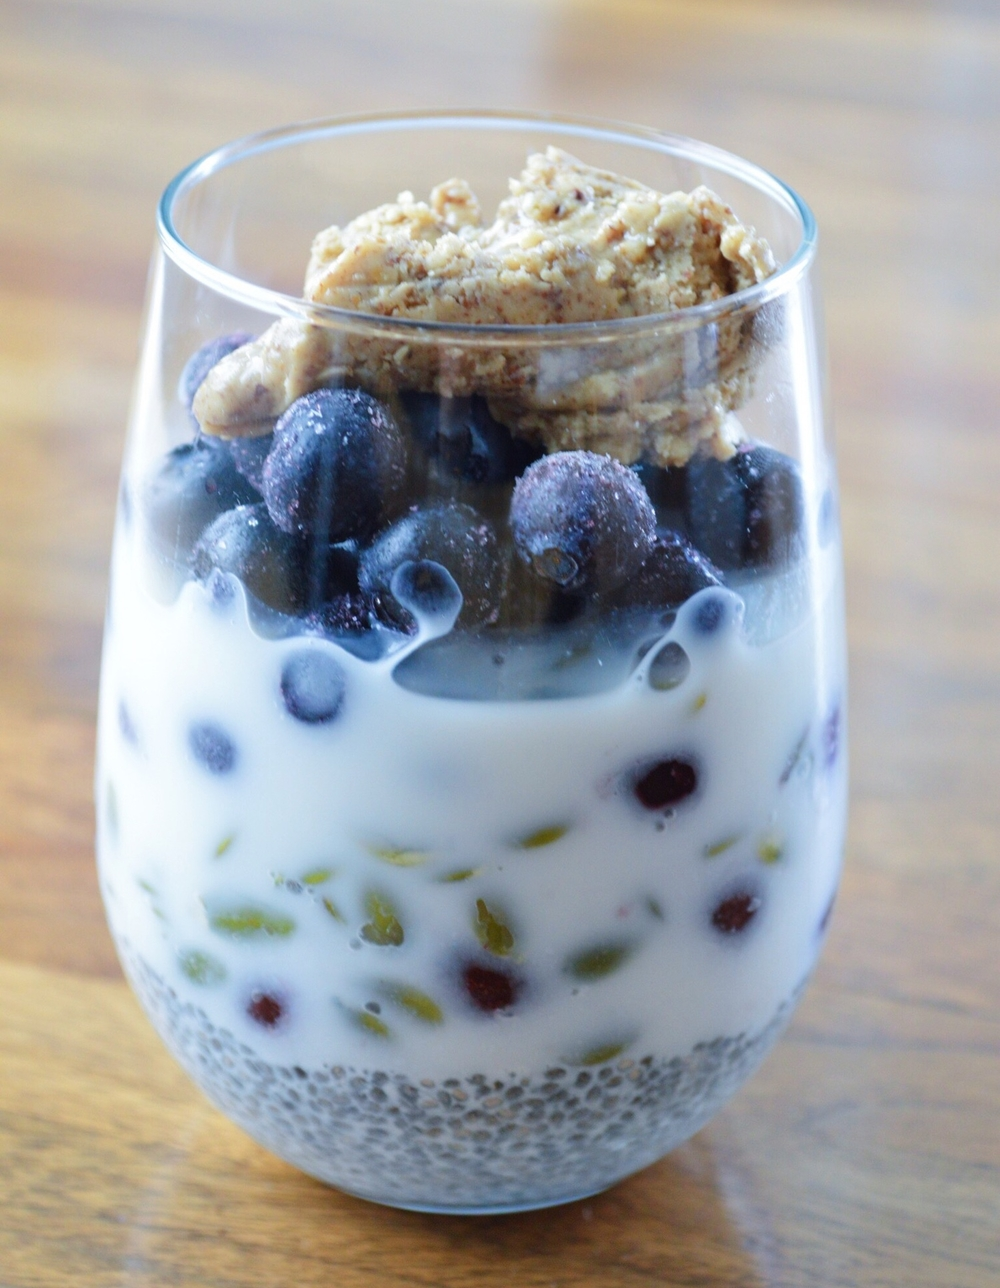 Chia-Seed-Breakfast-Parfait-LaurenSchwaiger-Blog.jpg